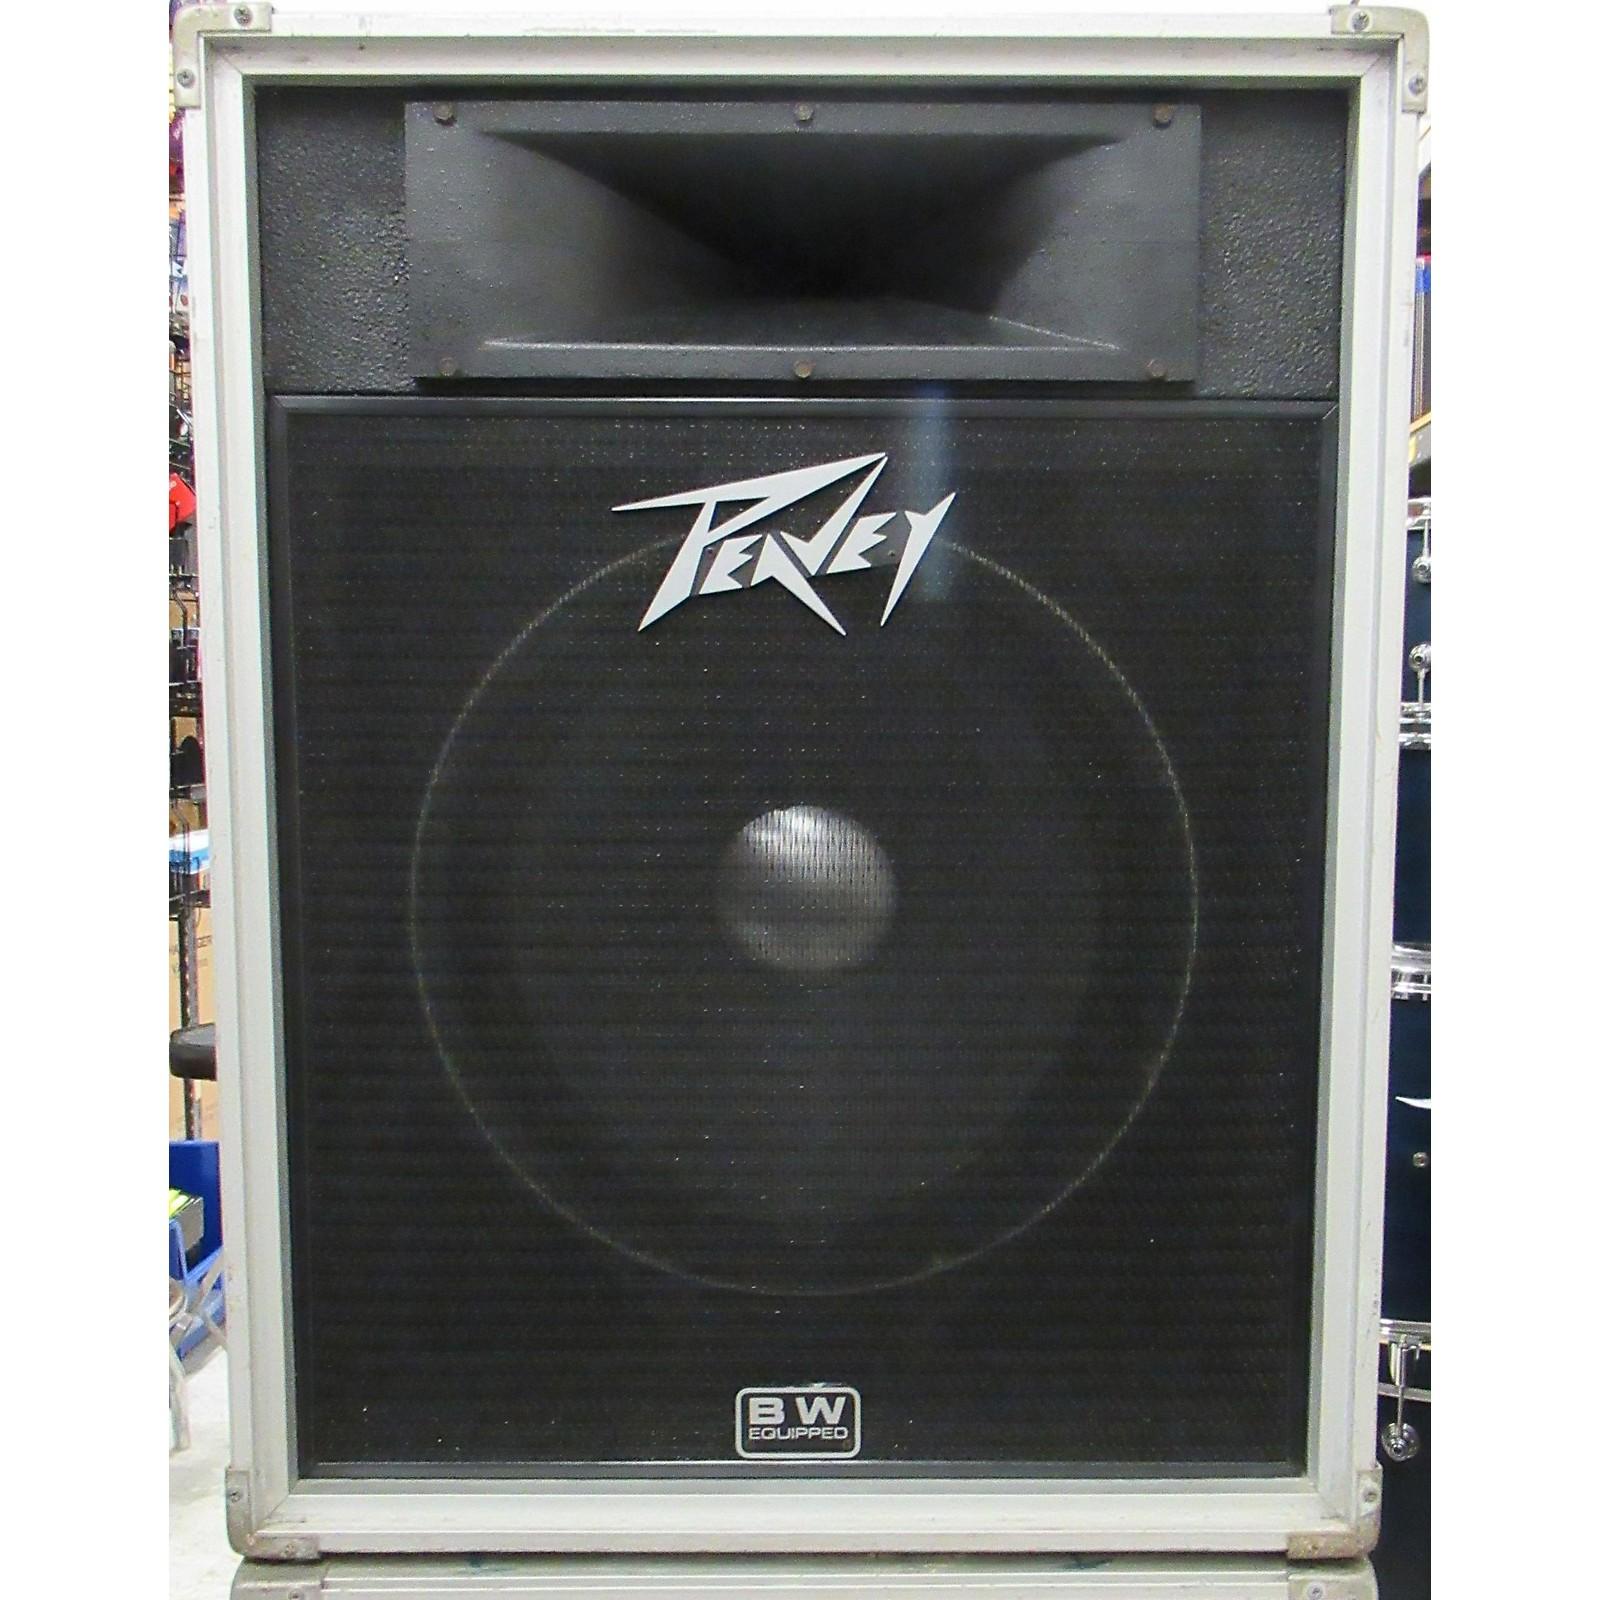 Peavey 115 International Precision Transducer Unpowered Speaker